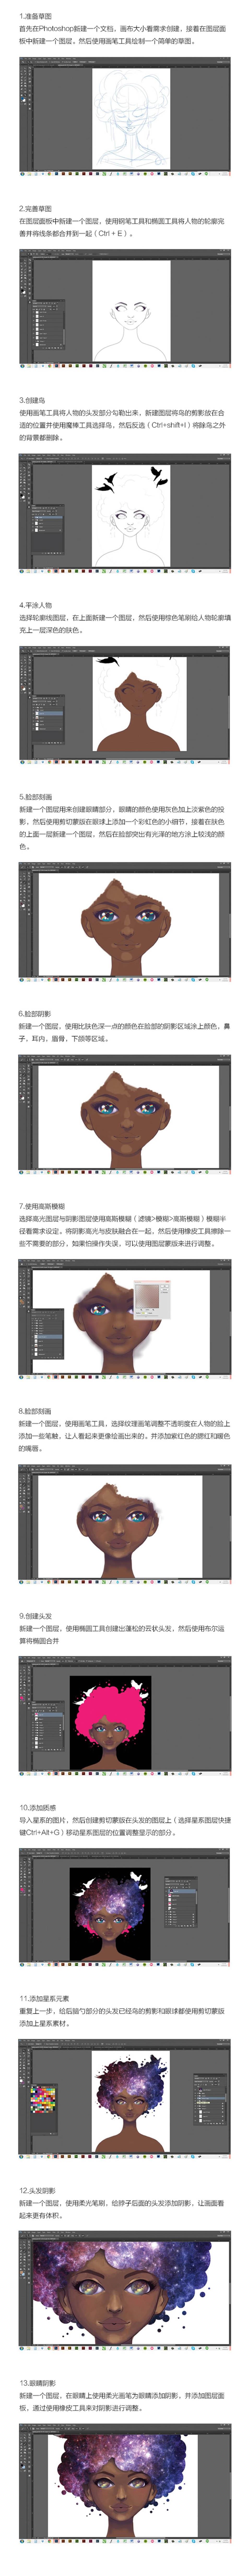 Photoshop繪製星空裝飾特效的少女插畫